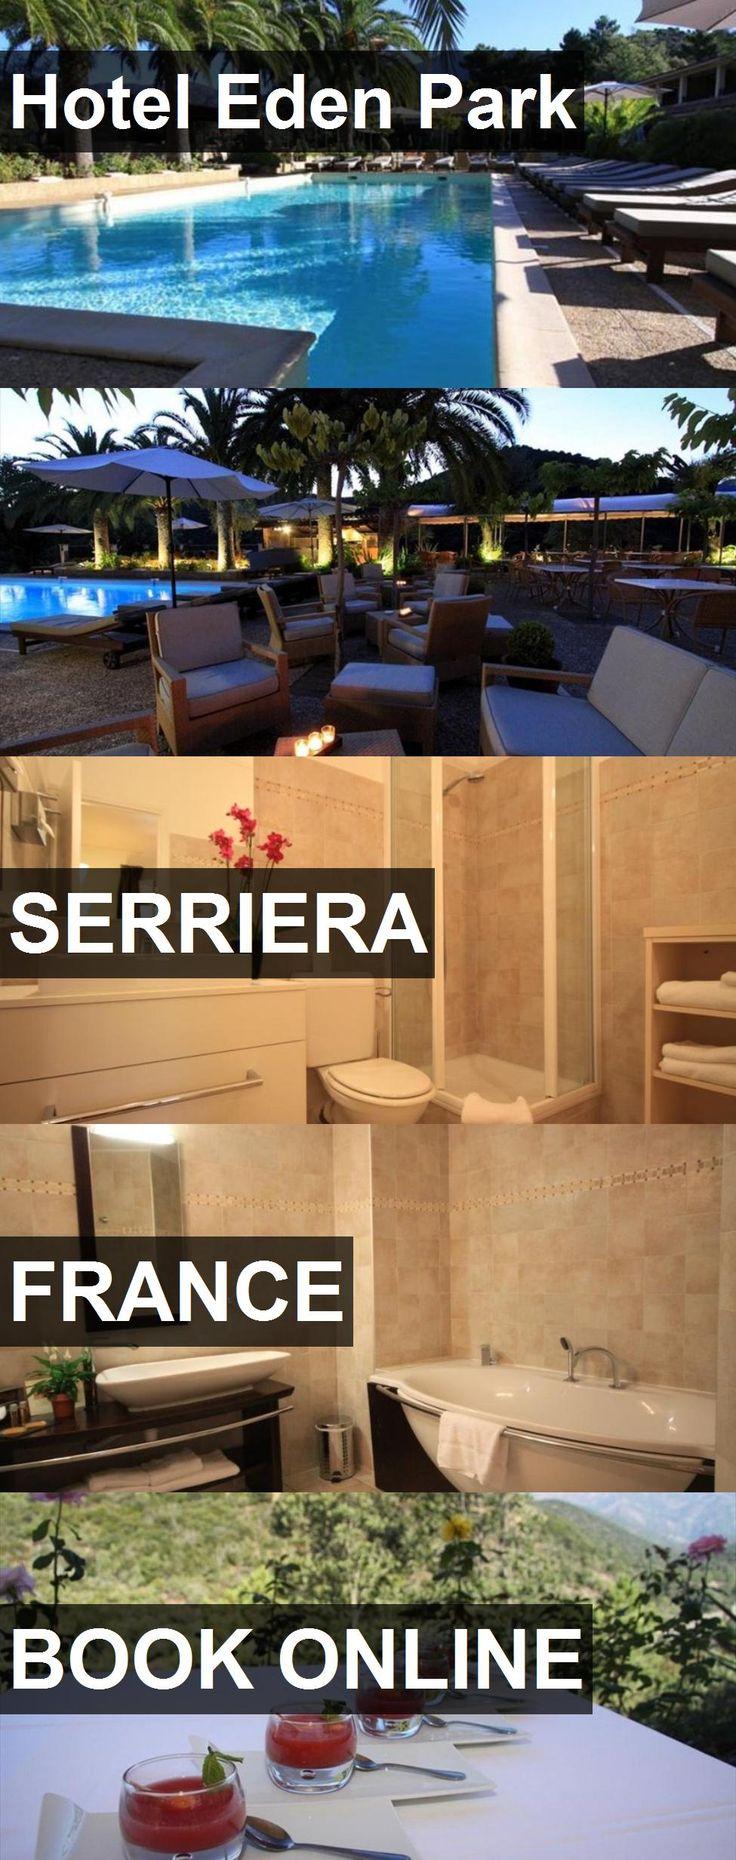 The 25 Best Hotel Eden Ideas On Pinterest Italy Travel  # Muebles Eden En Las Palmas